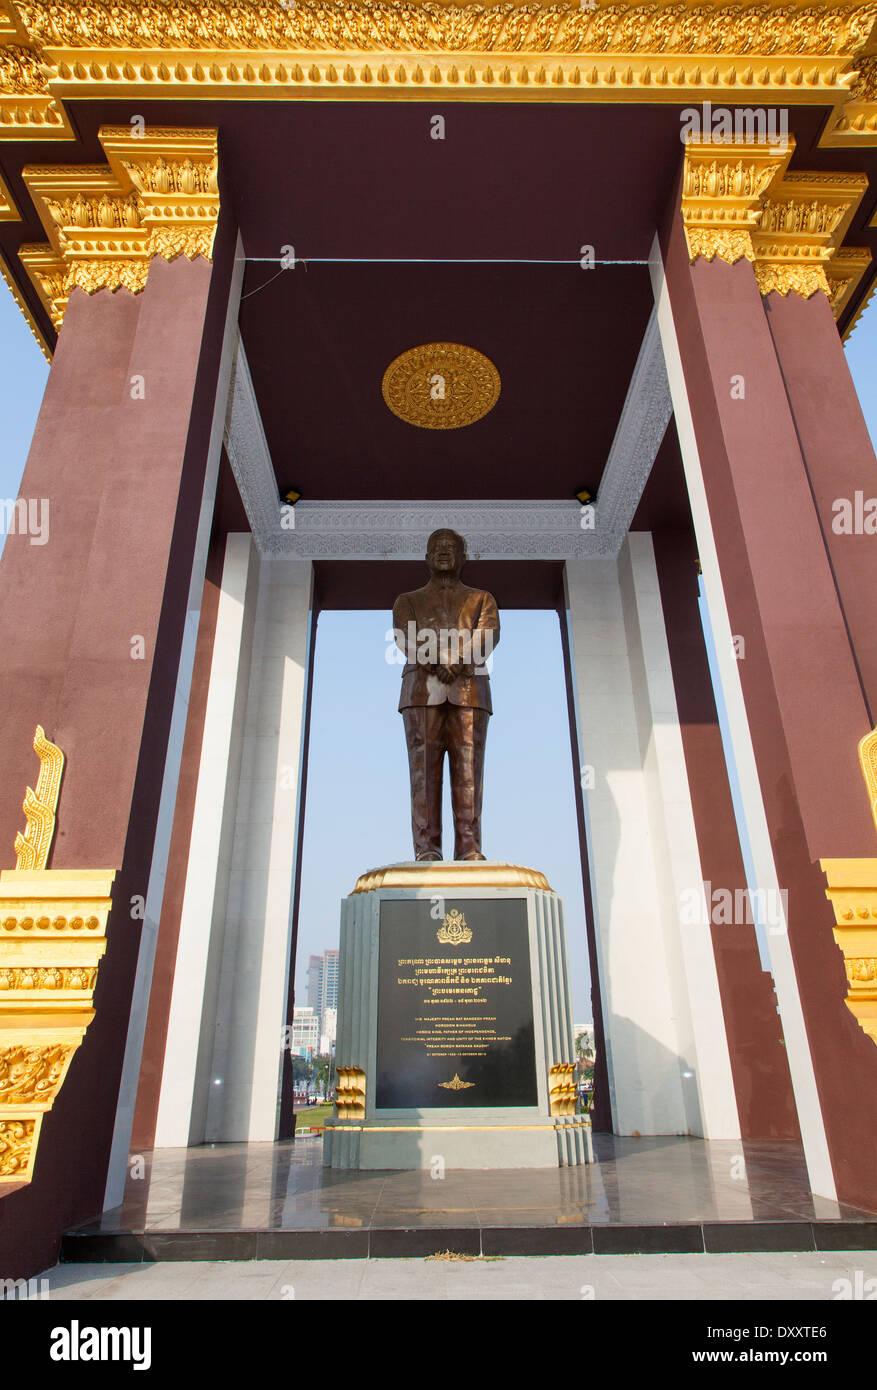 Statue of Norodom Sihanouk in Phnom Penh, Cambodia Stock Photo